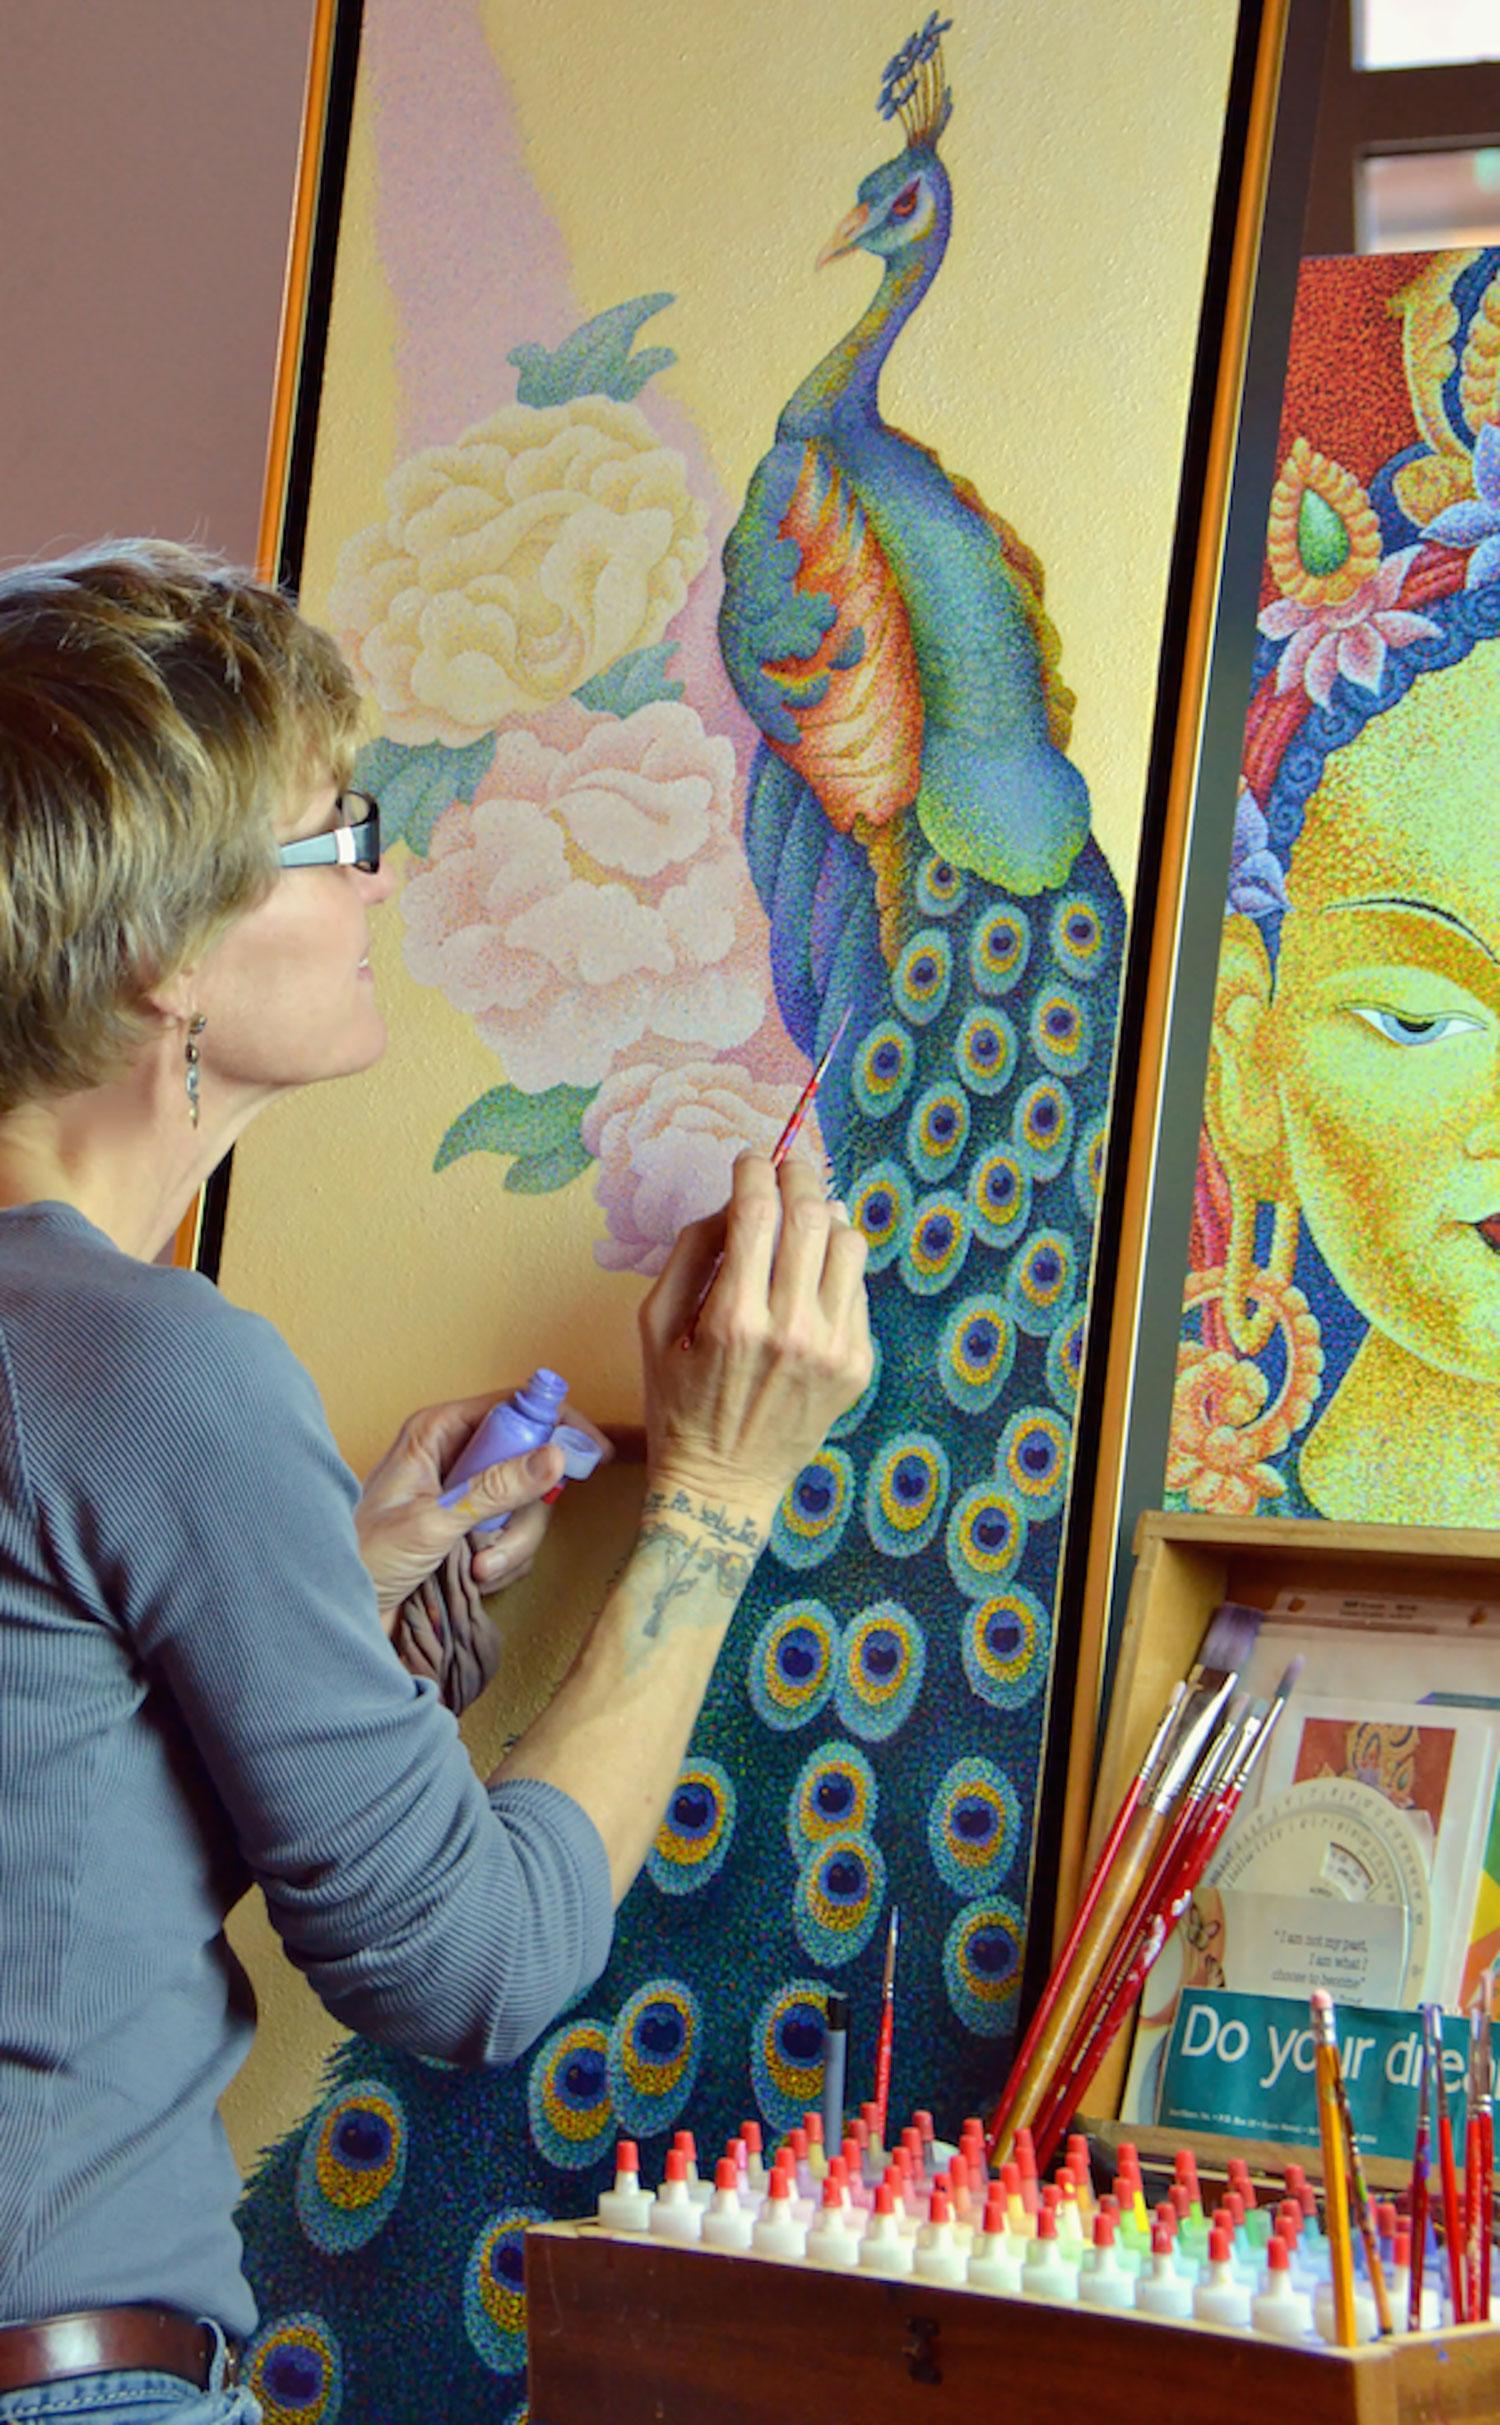 Artist Sherab Khandro painting a peacock